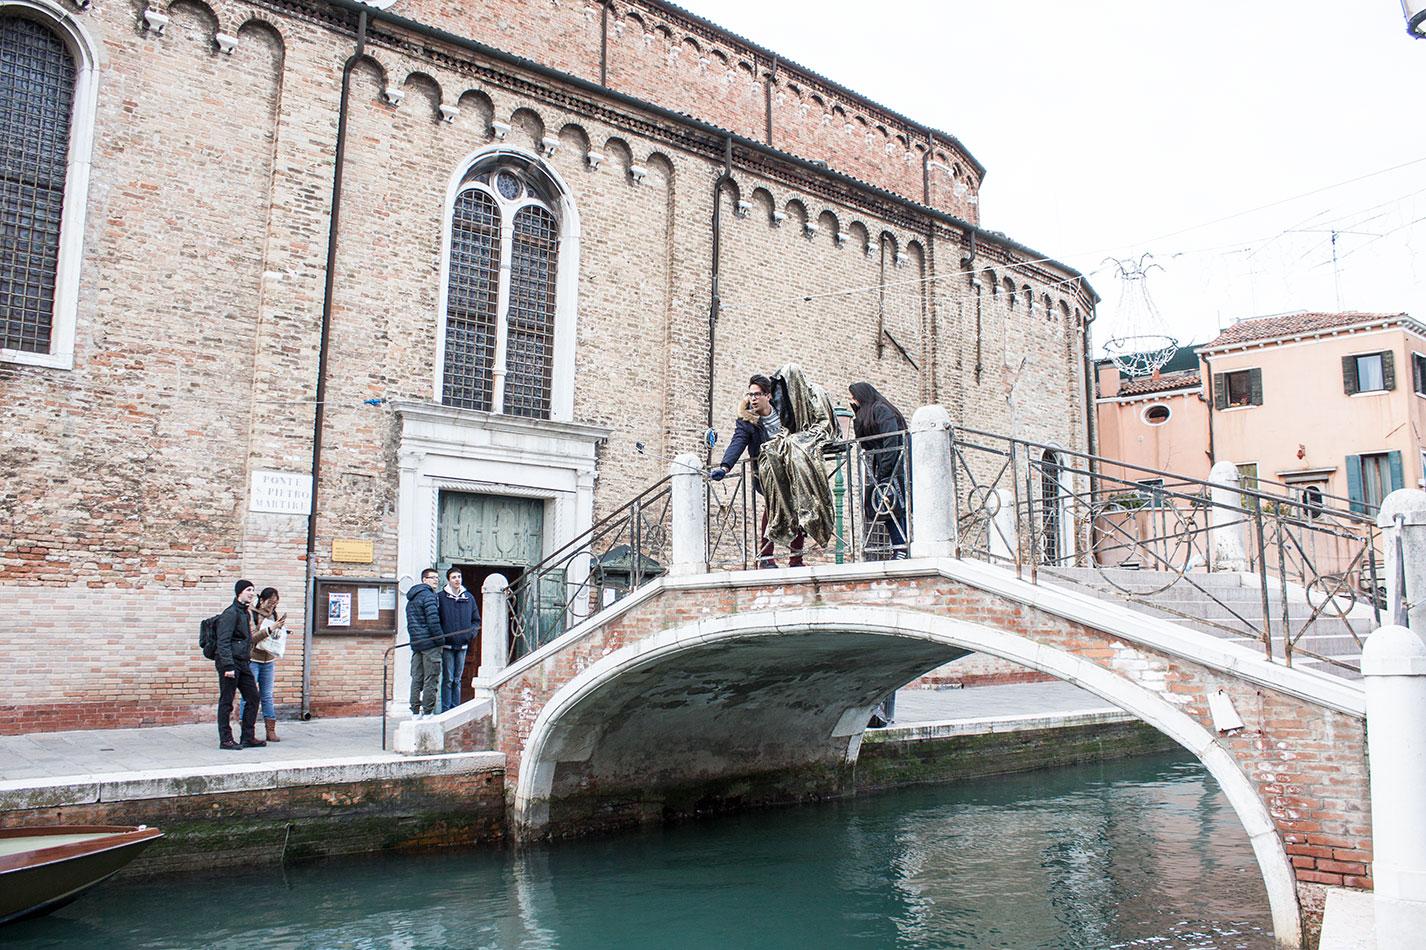 biennale-art-italia-venice-murano-glas-berengo-show-guardians-of-time-manfred-kielnhofer-public-contemporary-art-sculpture-design-7218